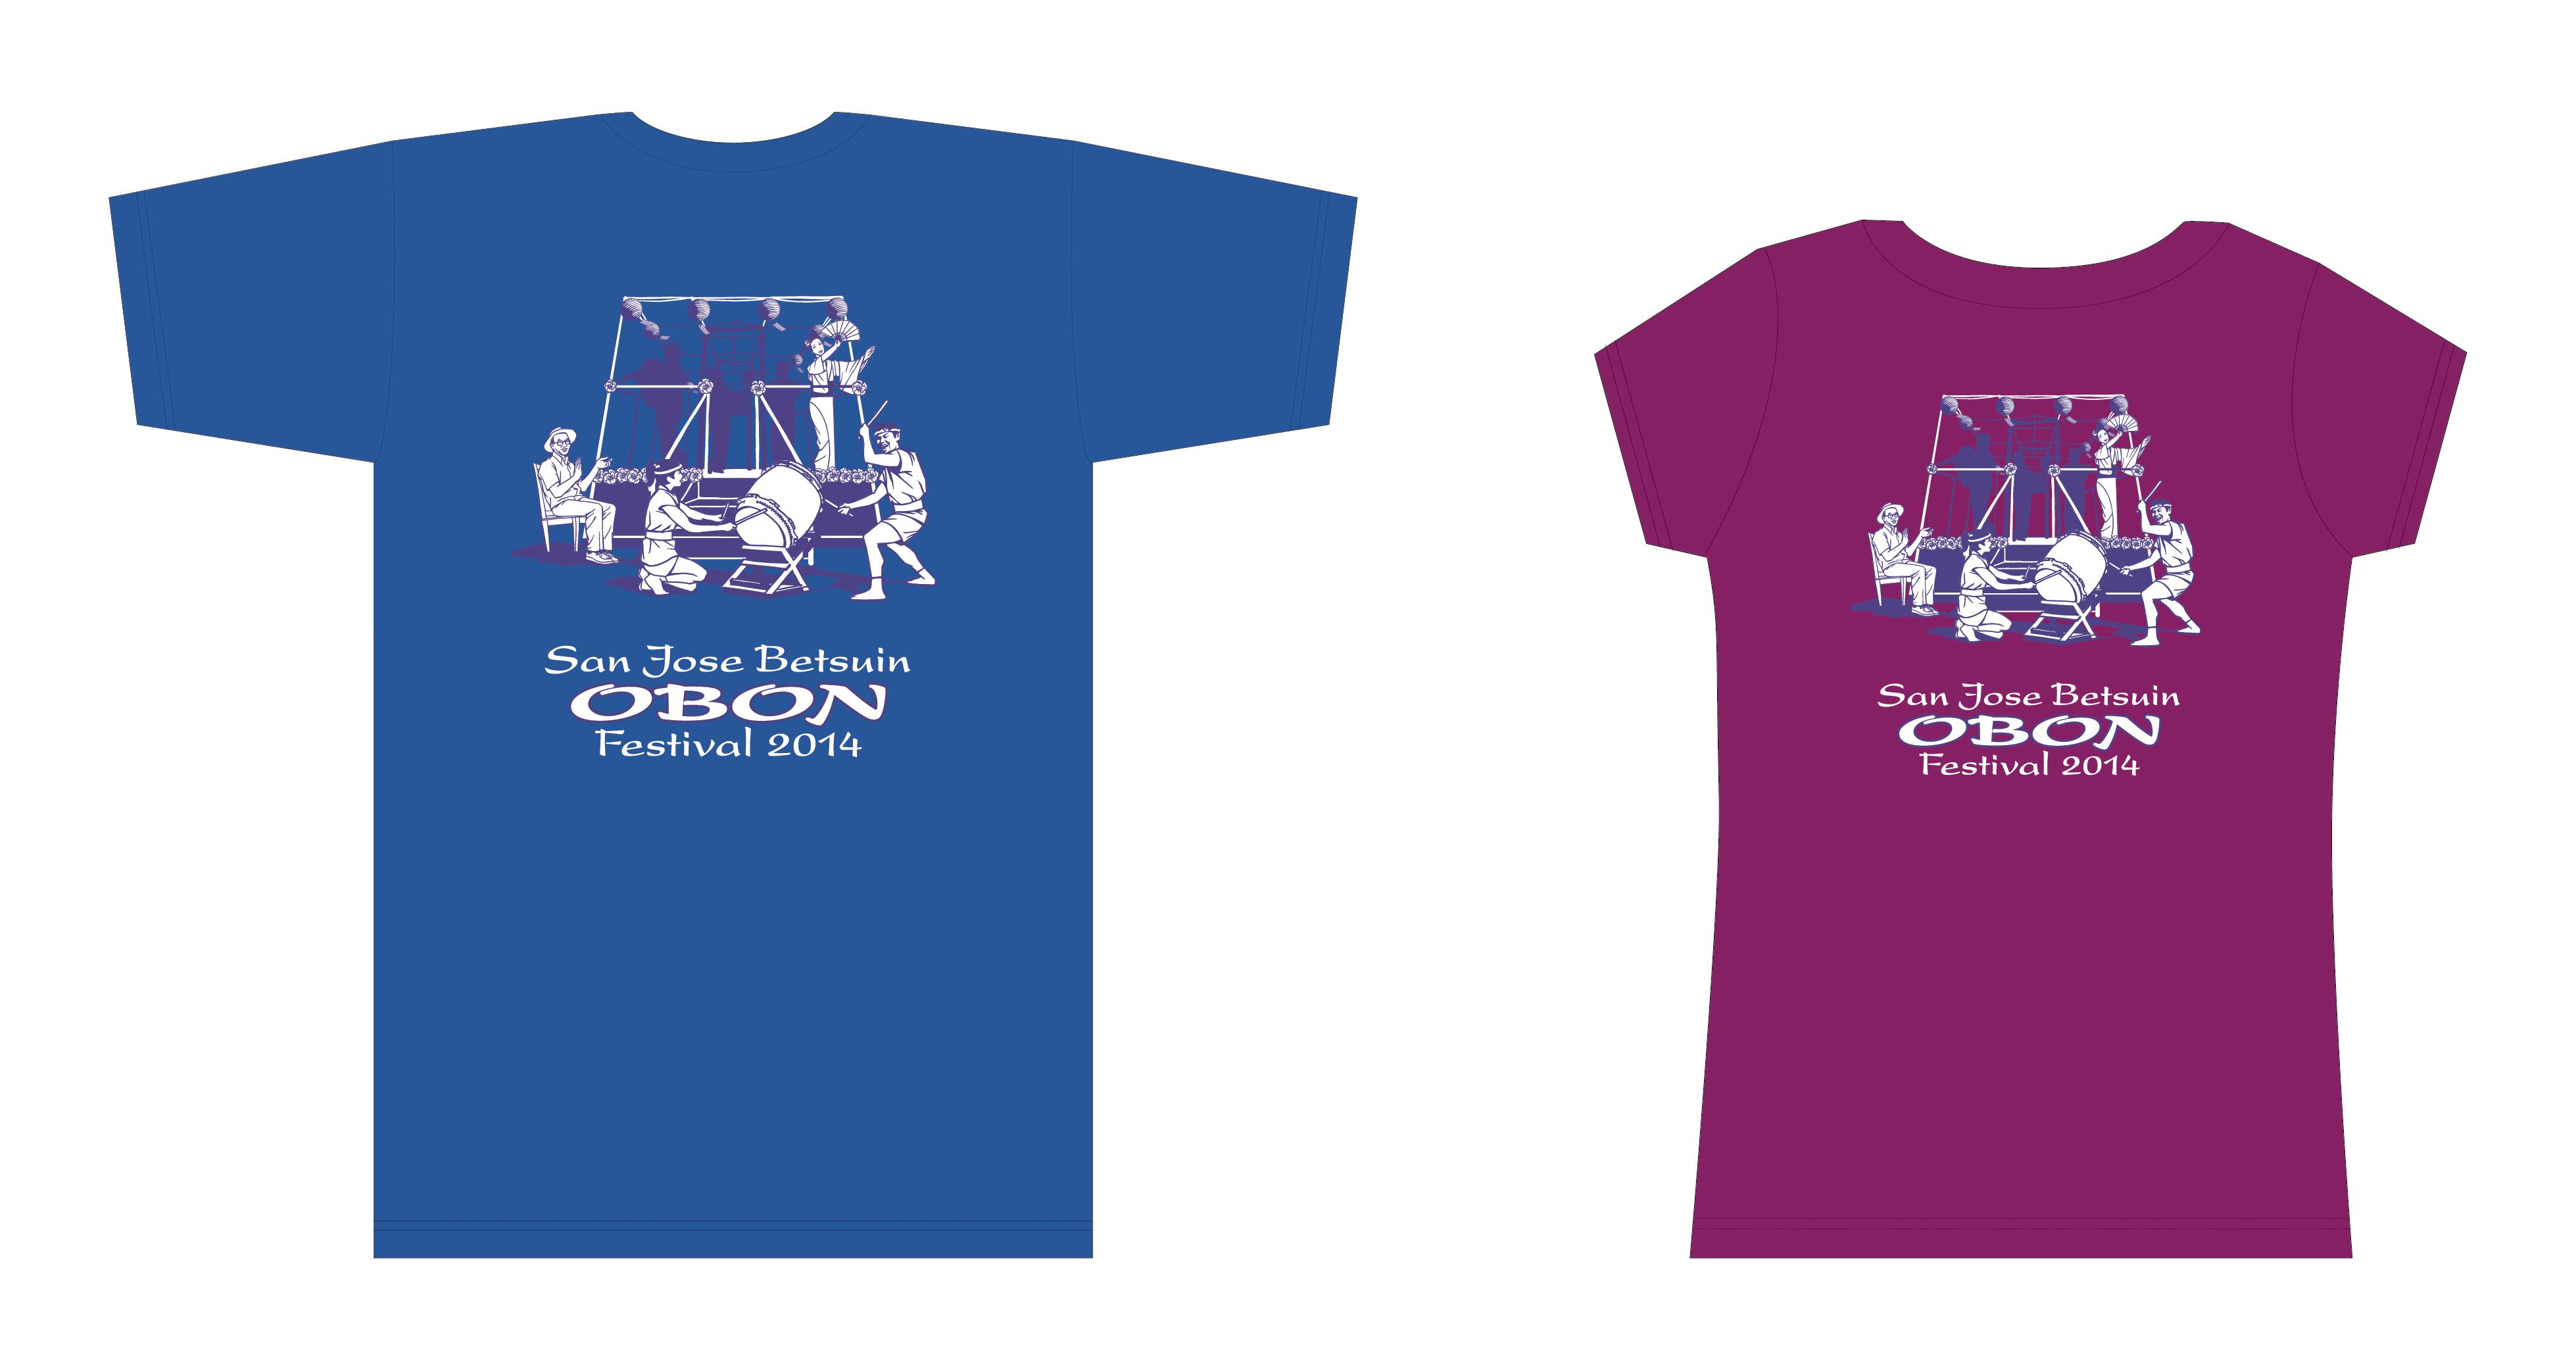 Festival T-shirts